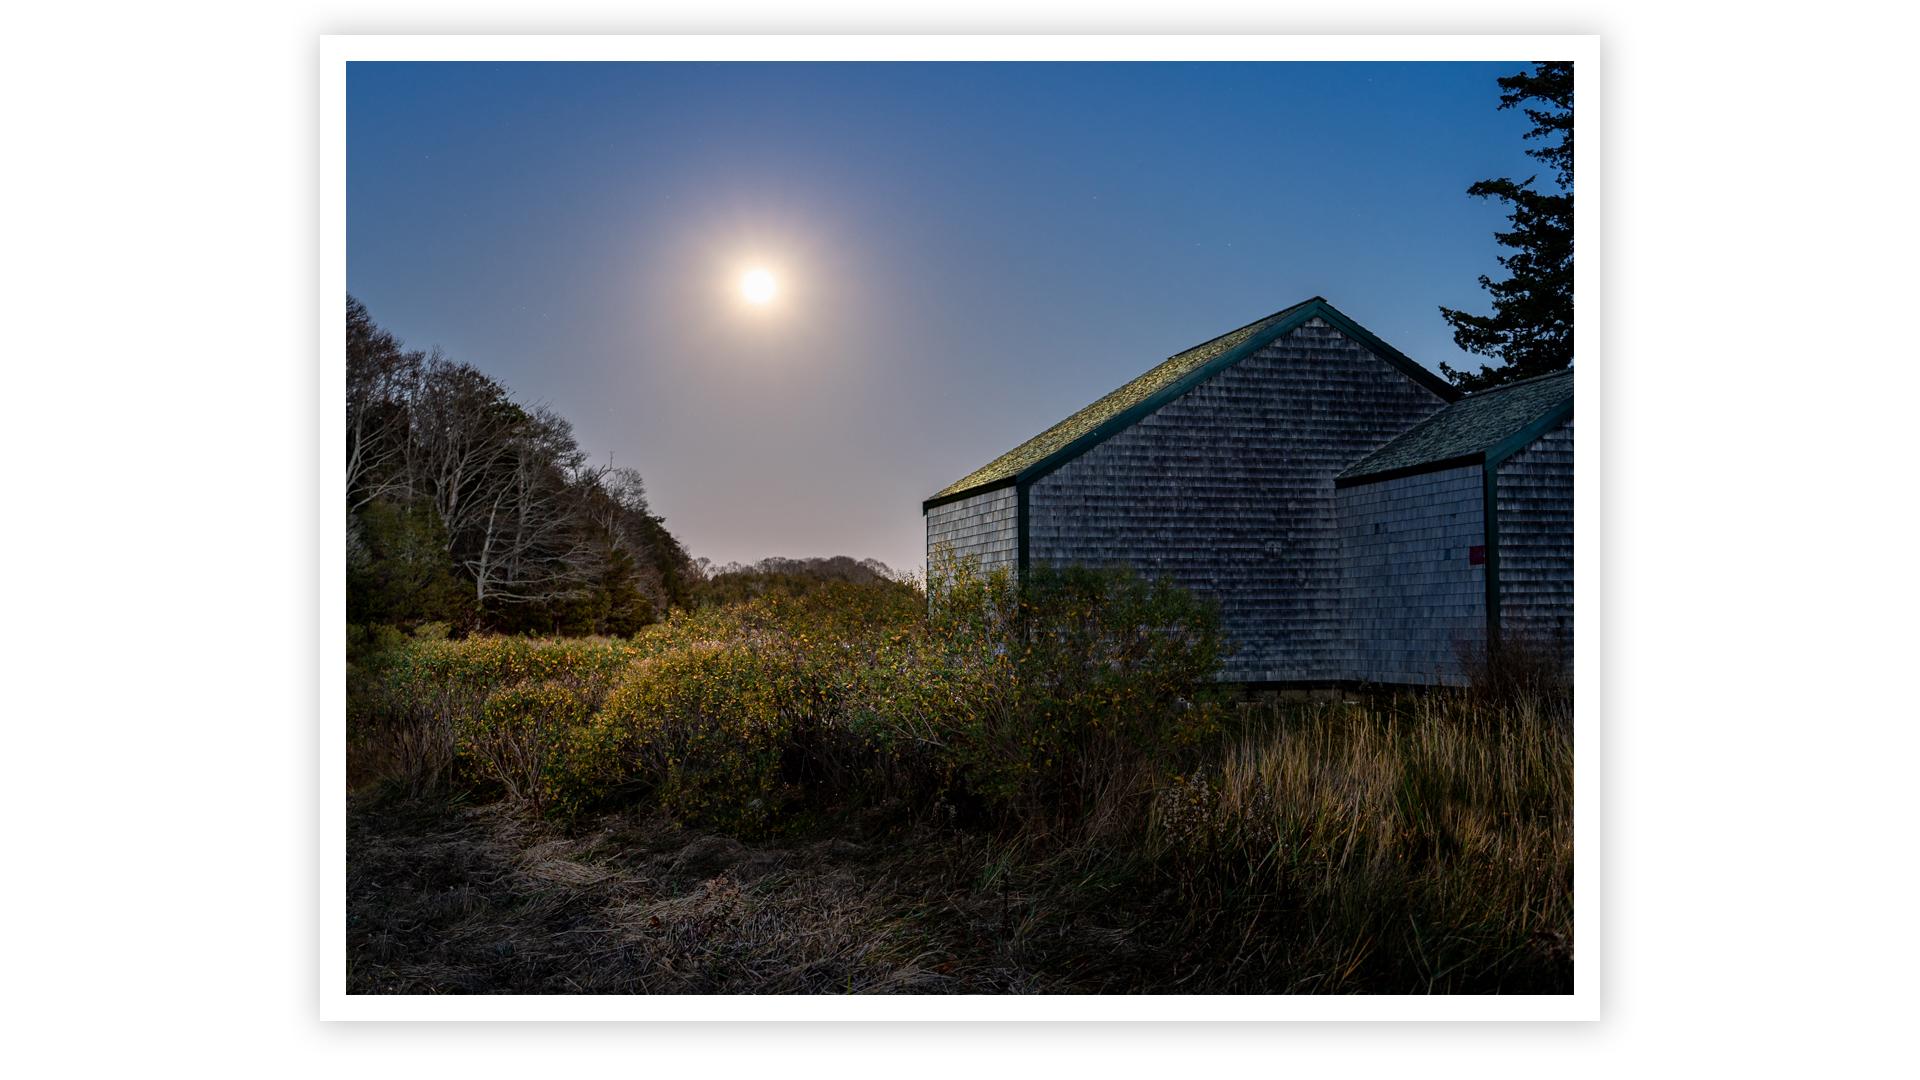 Moonrise at Salt Pond by John Tunney